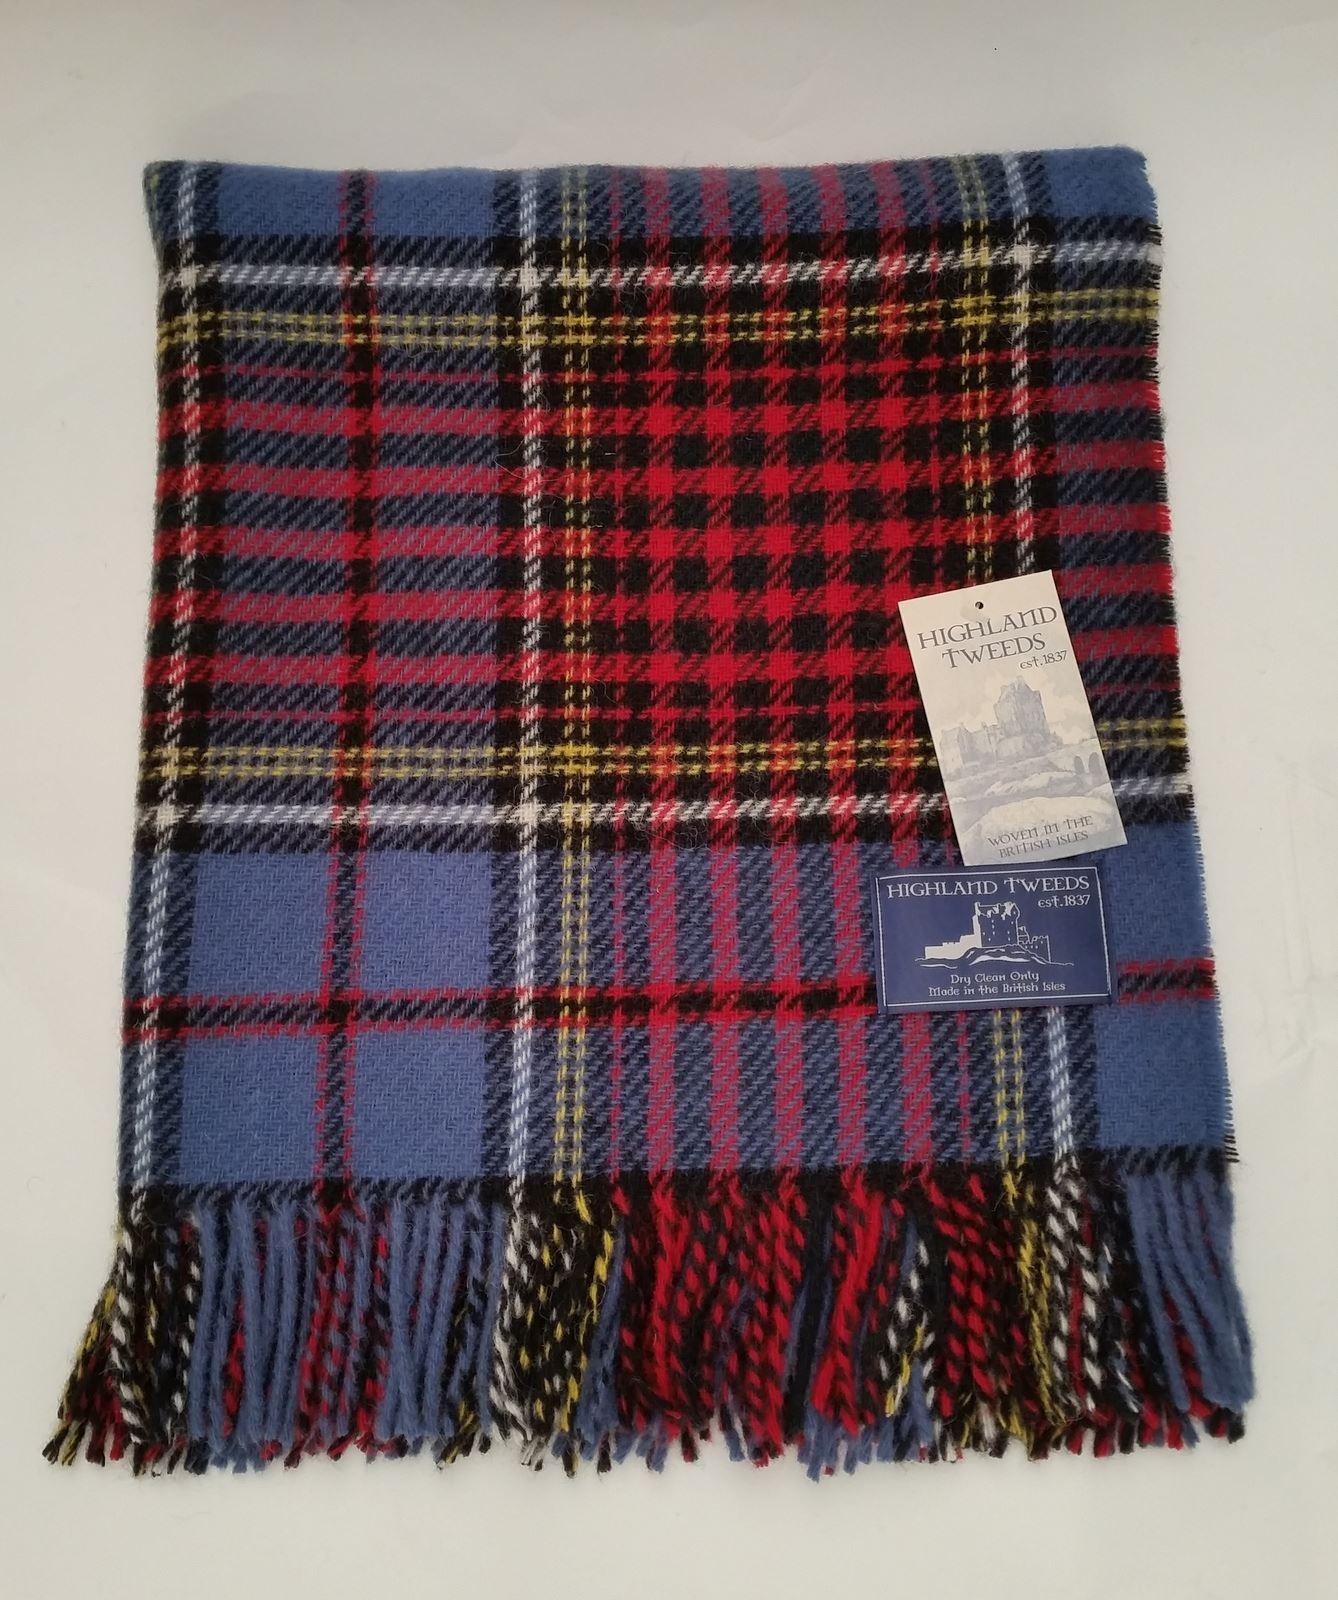 bronte tartan wool knee car rug british made small blanket throw highland tweeds ebay. Black Bedroom Furniture Sets. Home Design Ideas